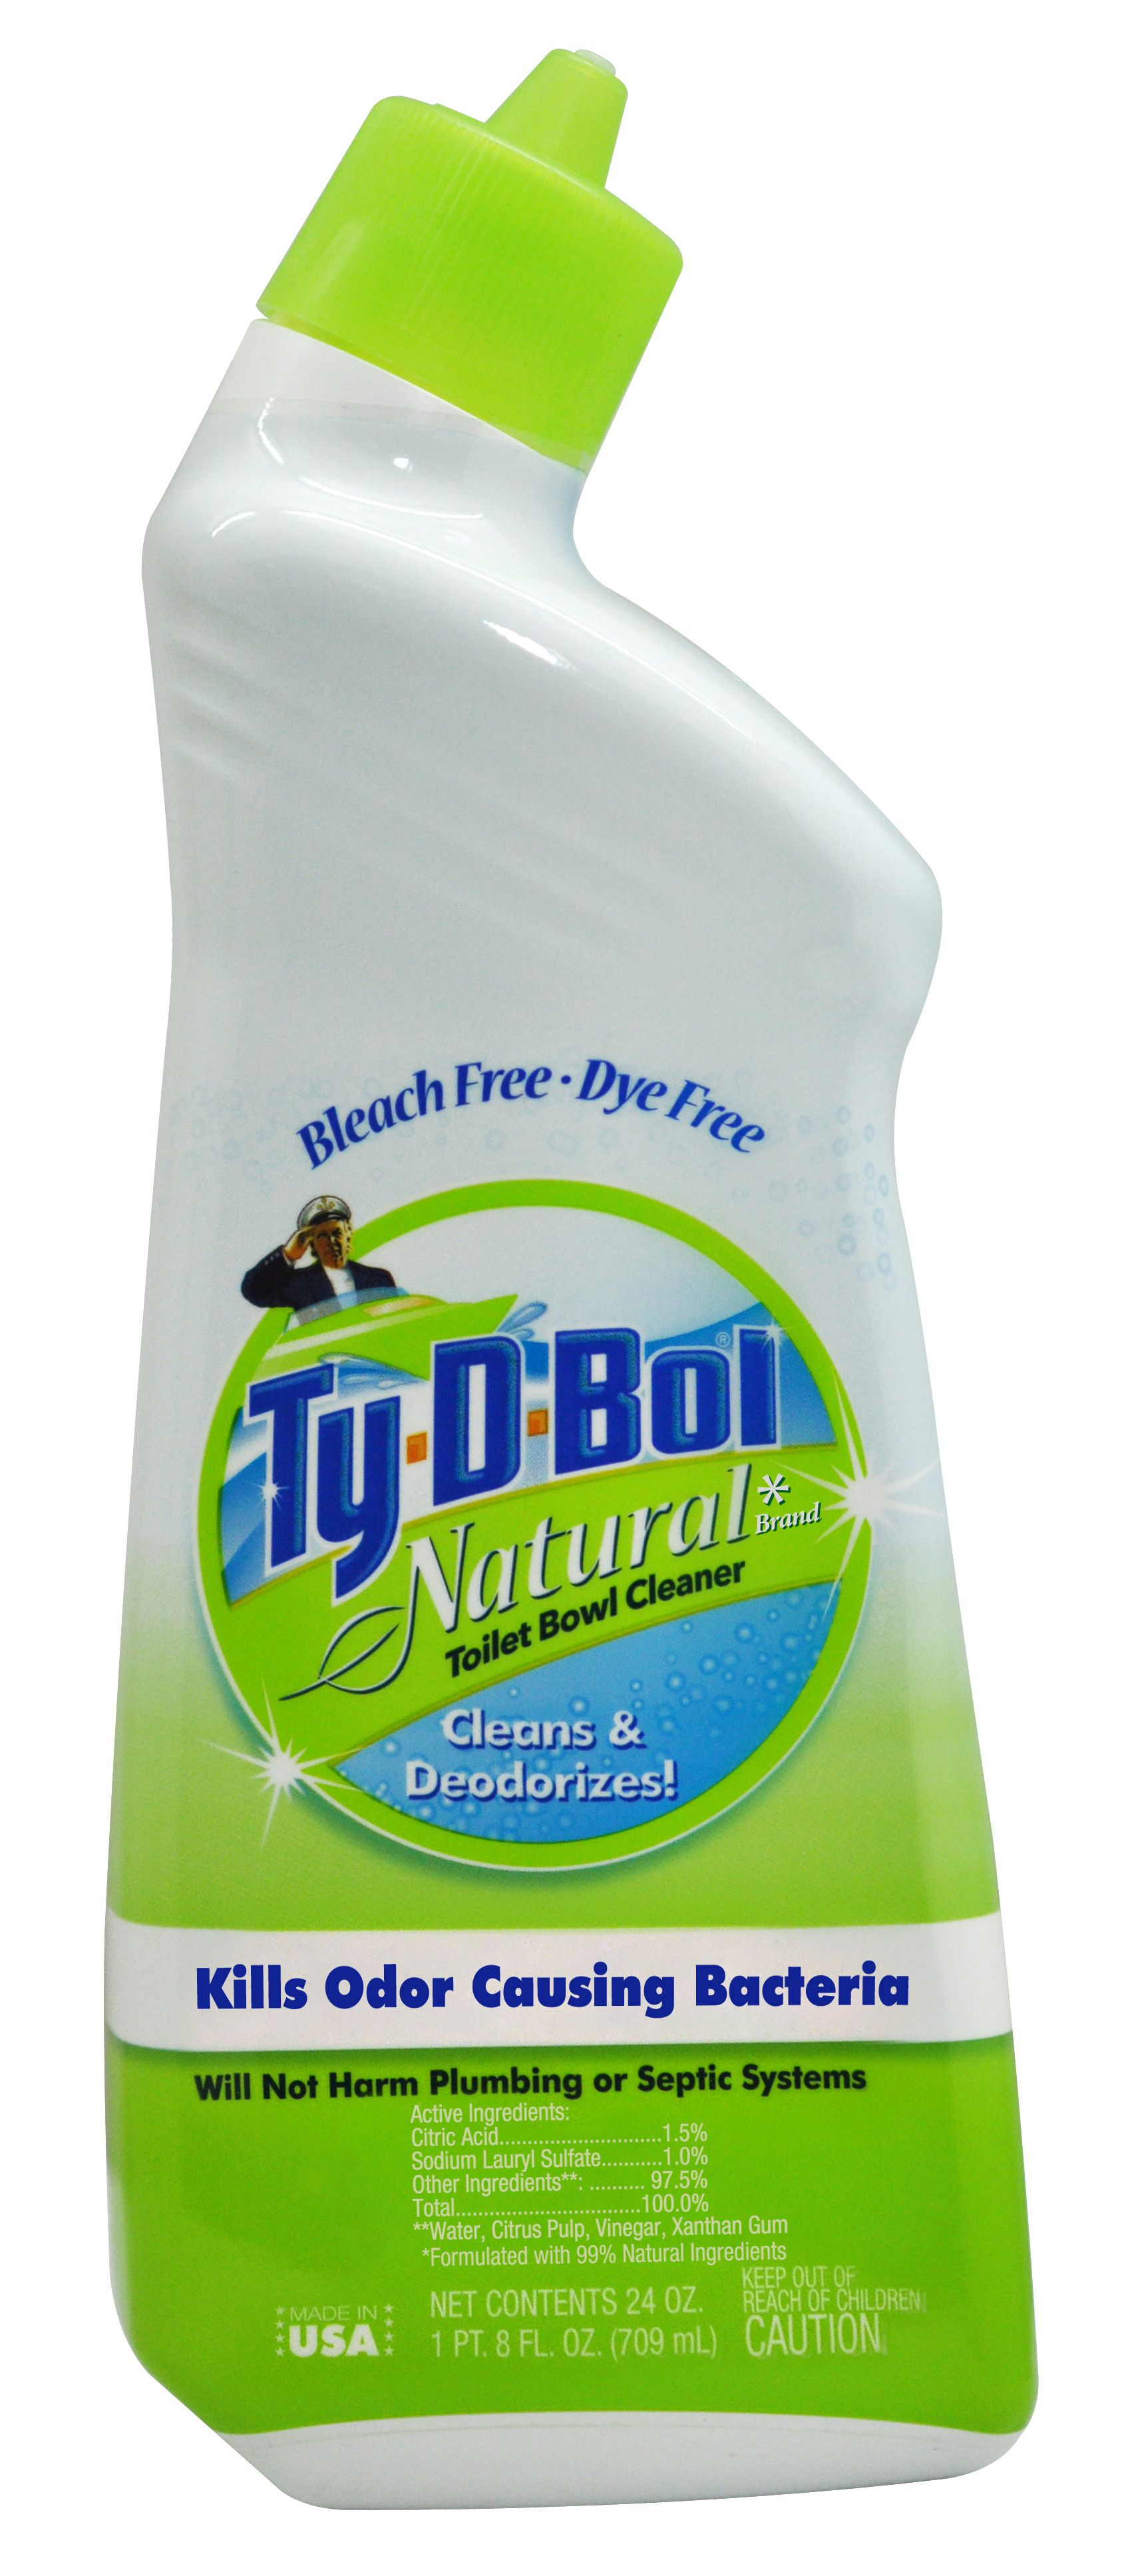 Ty D Bol Natural Brand Toilet Bowl Cleaner 2 Count Toilet Bowl Toilet Bowl Cleaner Clean Toilet Bowl